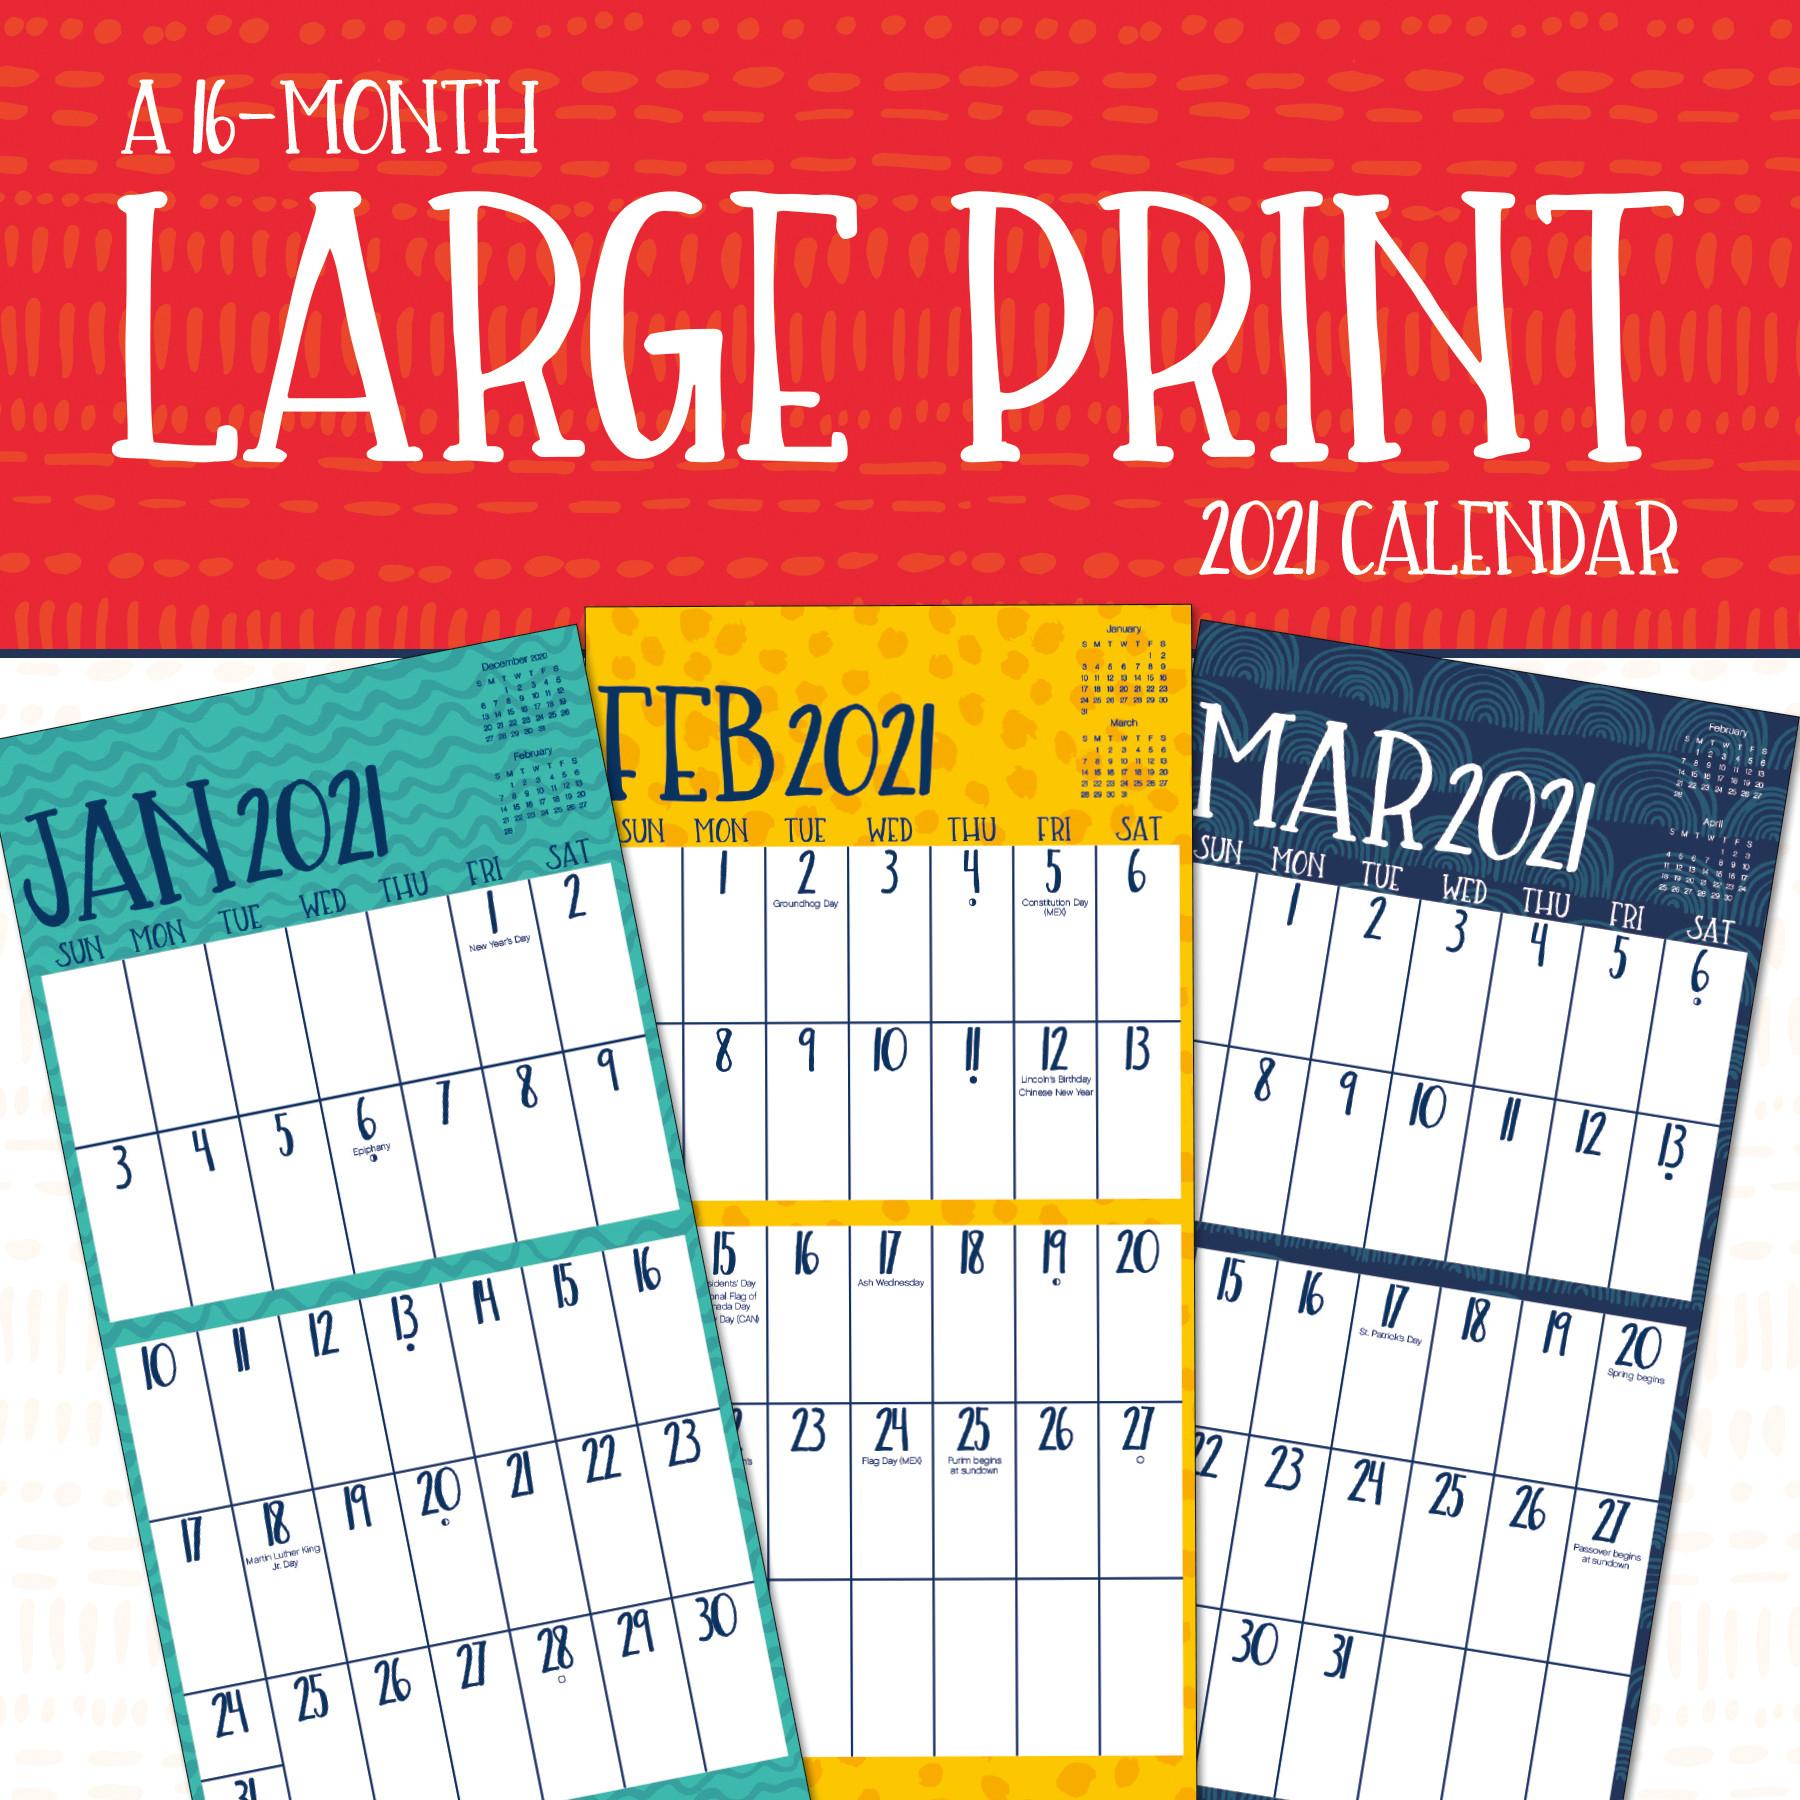 2021 Large Print Wall Calendar - Walmart - Walmart  2021 Daily Wall Calendar Free